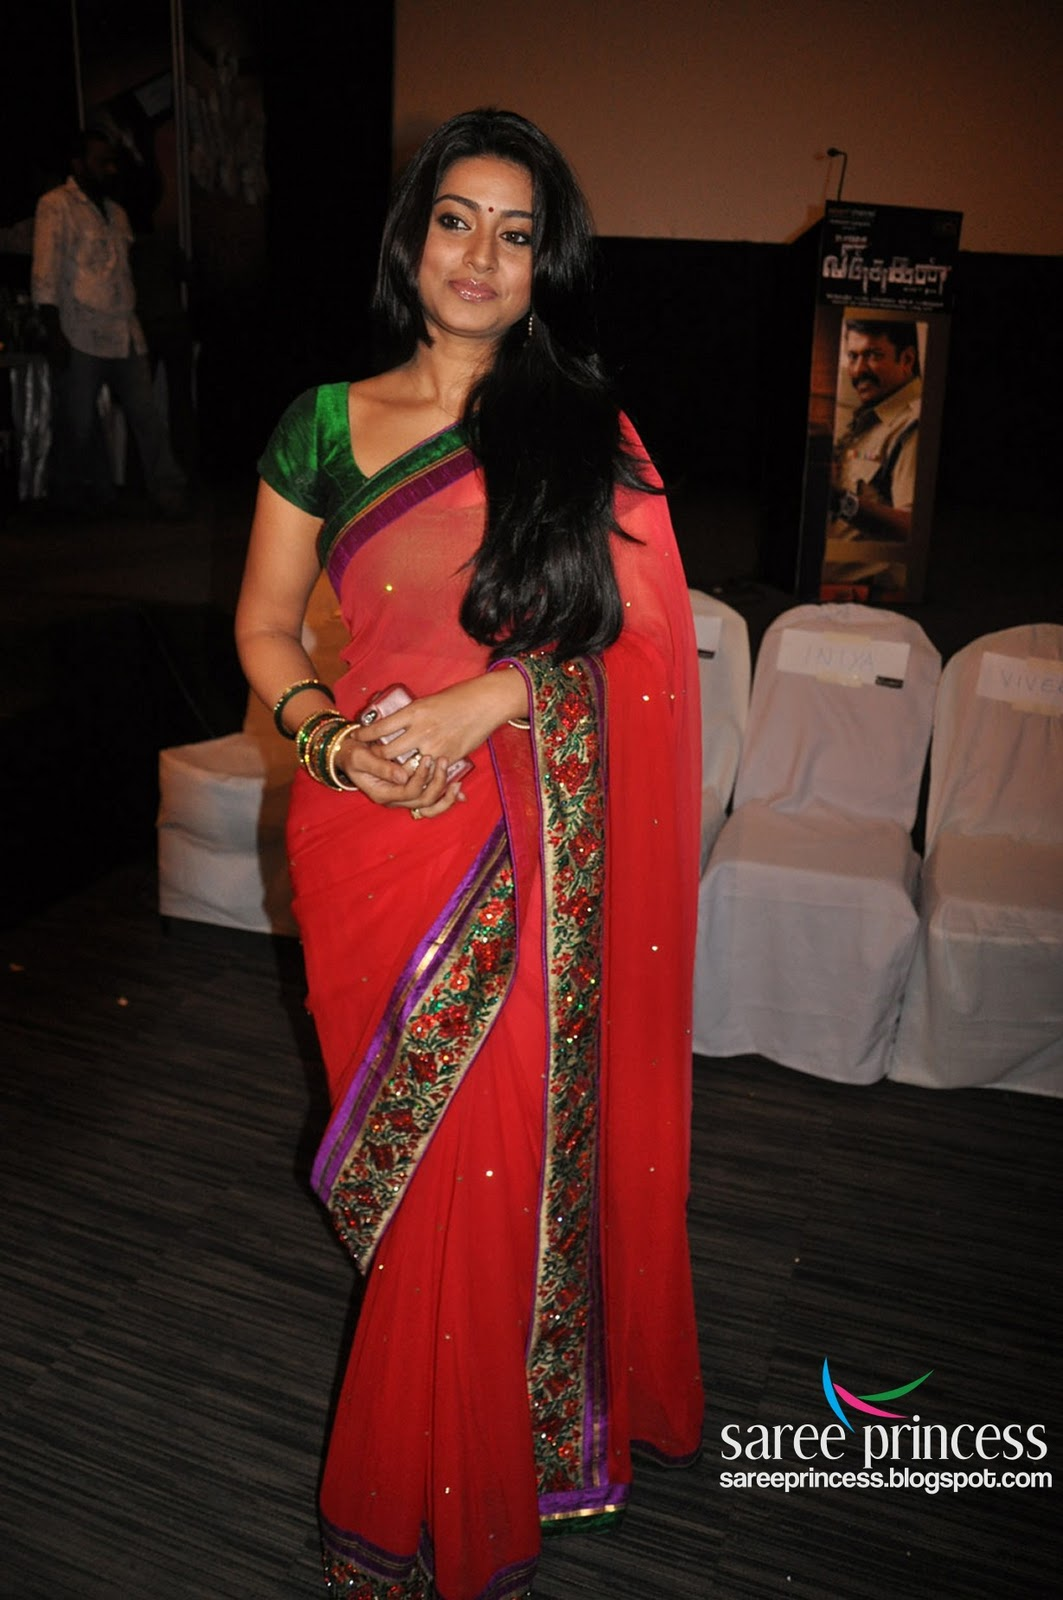 Zarine Khan Cute Wallpaper Tamil Actress Sneha Looking Cute Latest Hq Stills In A Red